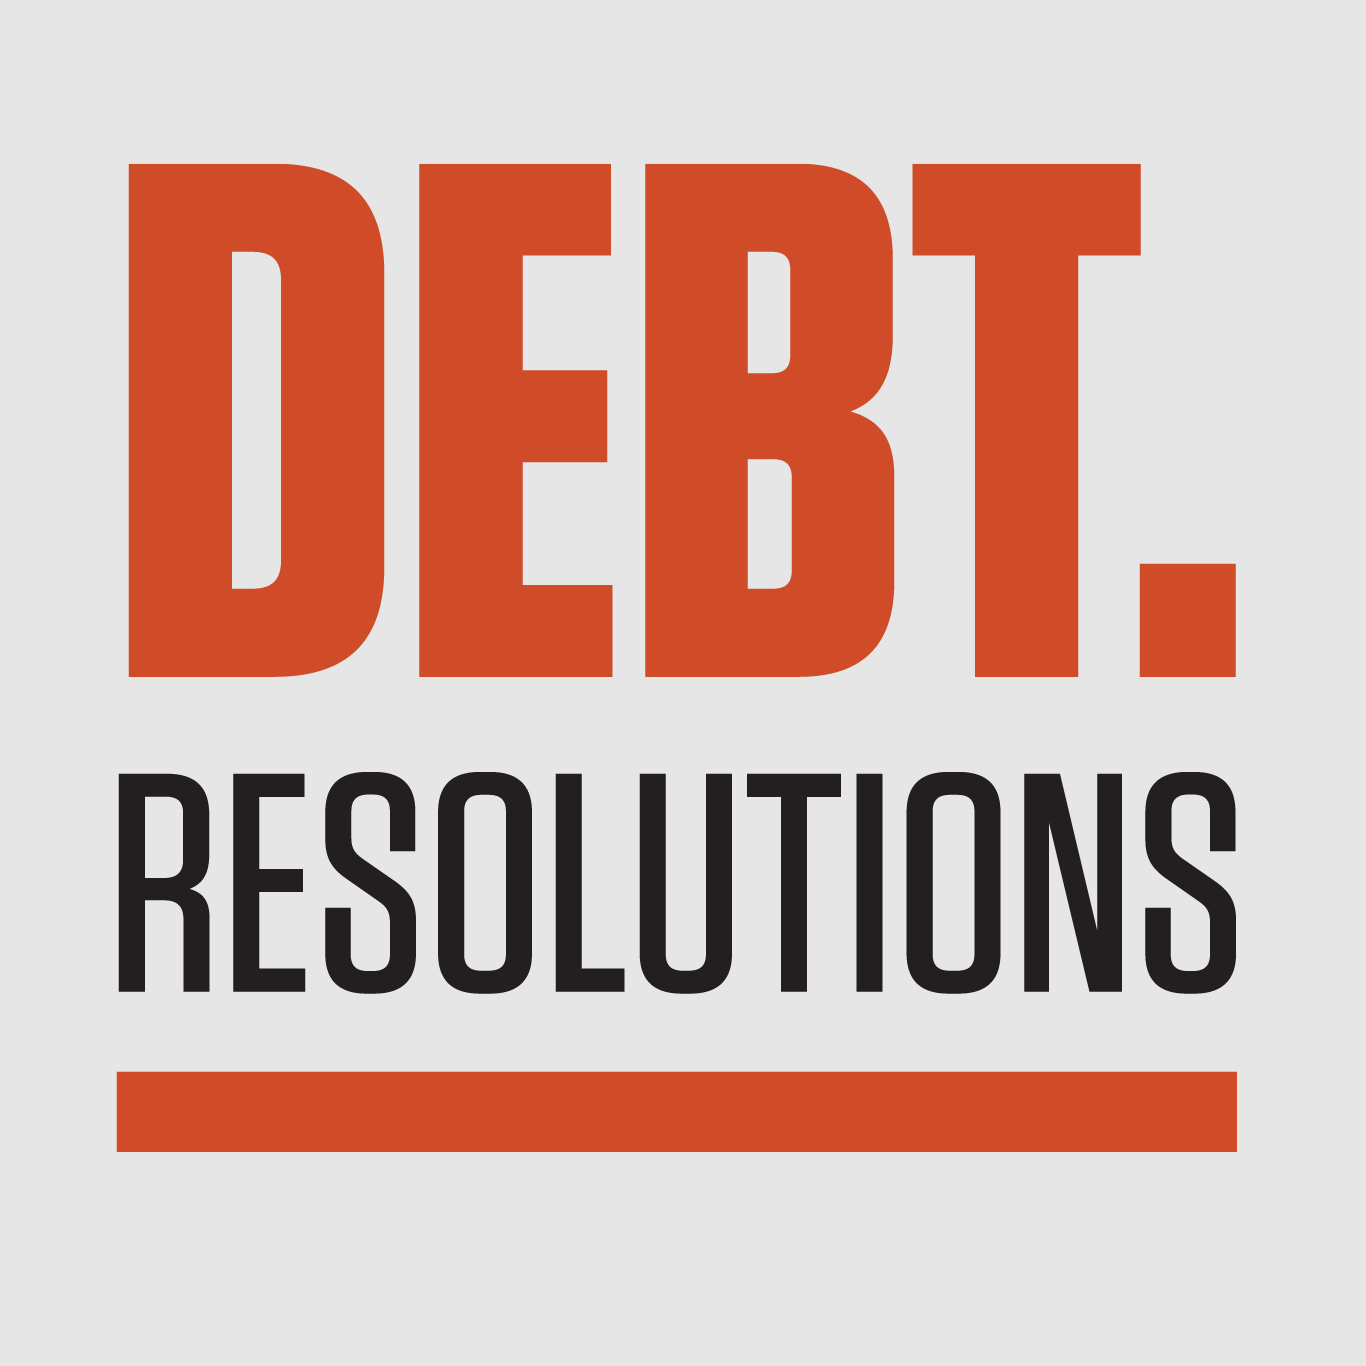 Debt Resolutions-01.png